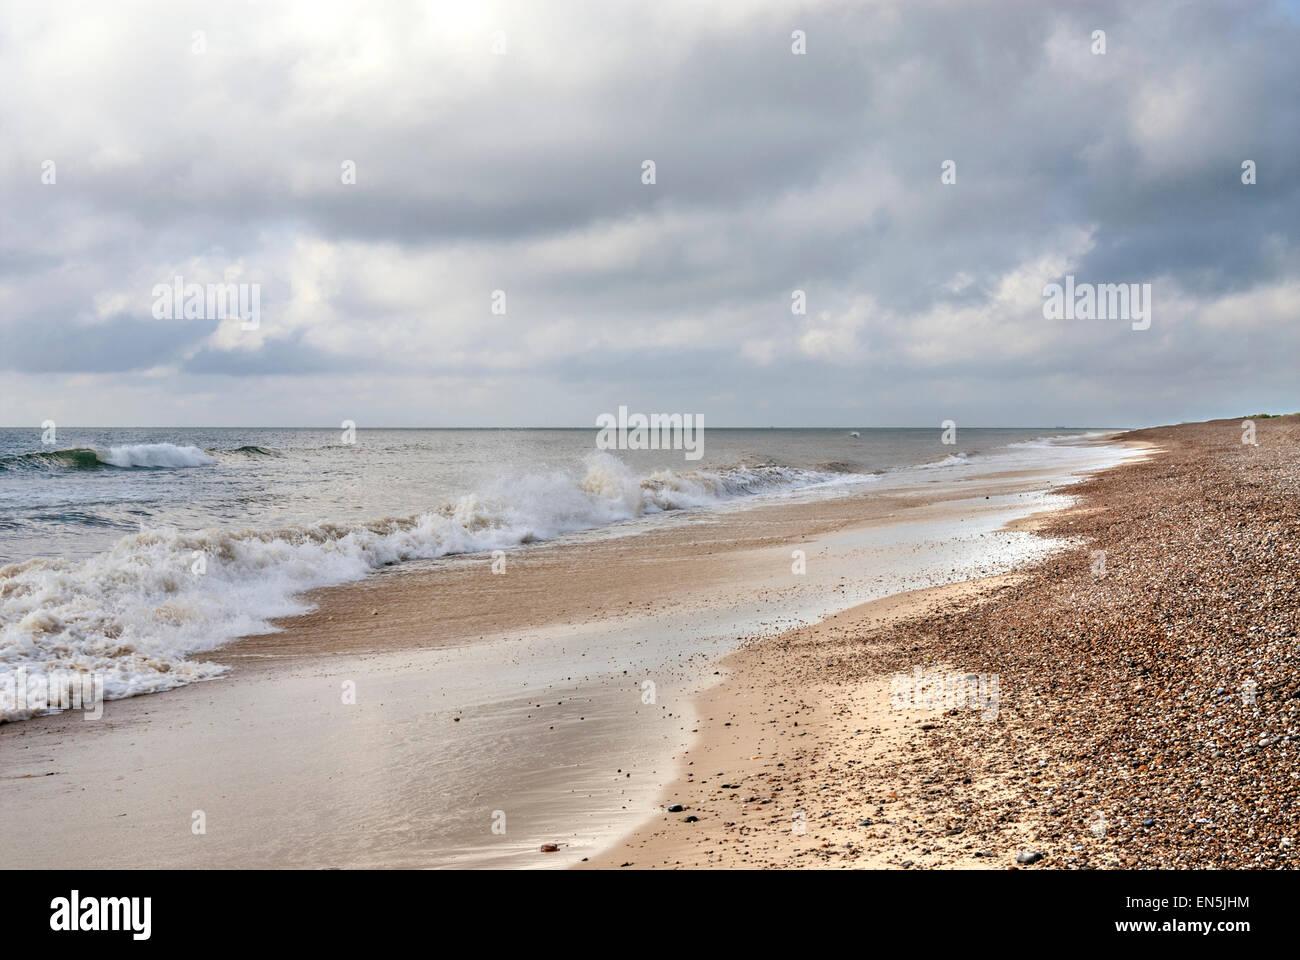 Stormy Coastal seascape near Kessingland in East Anglia, England - Stock Image